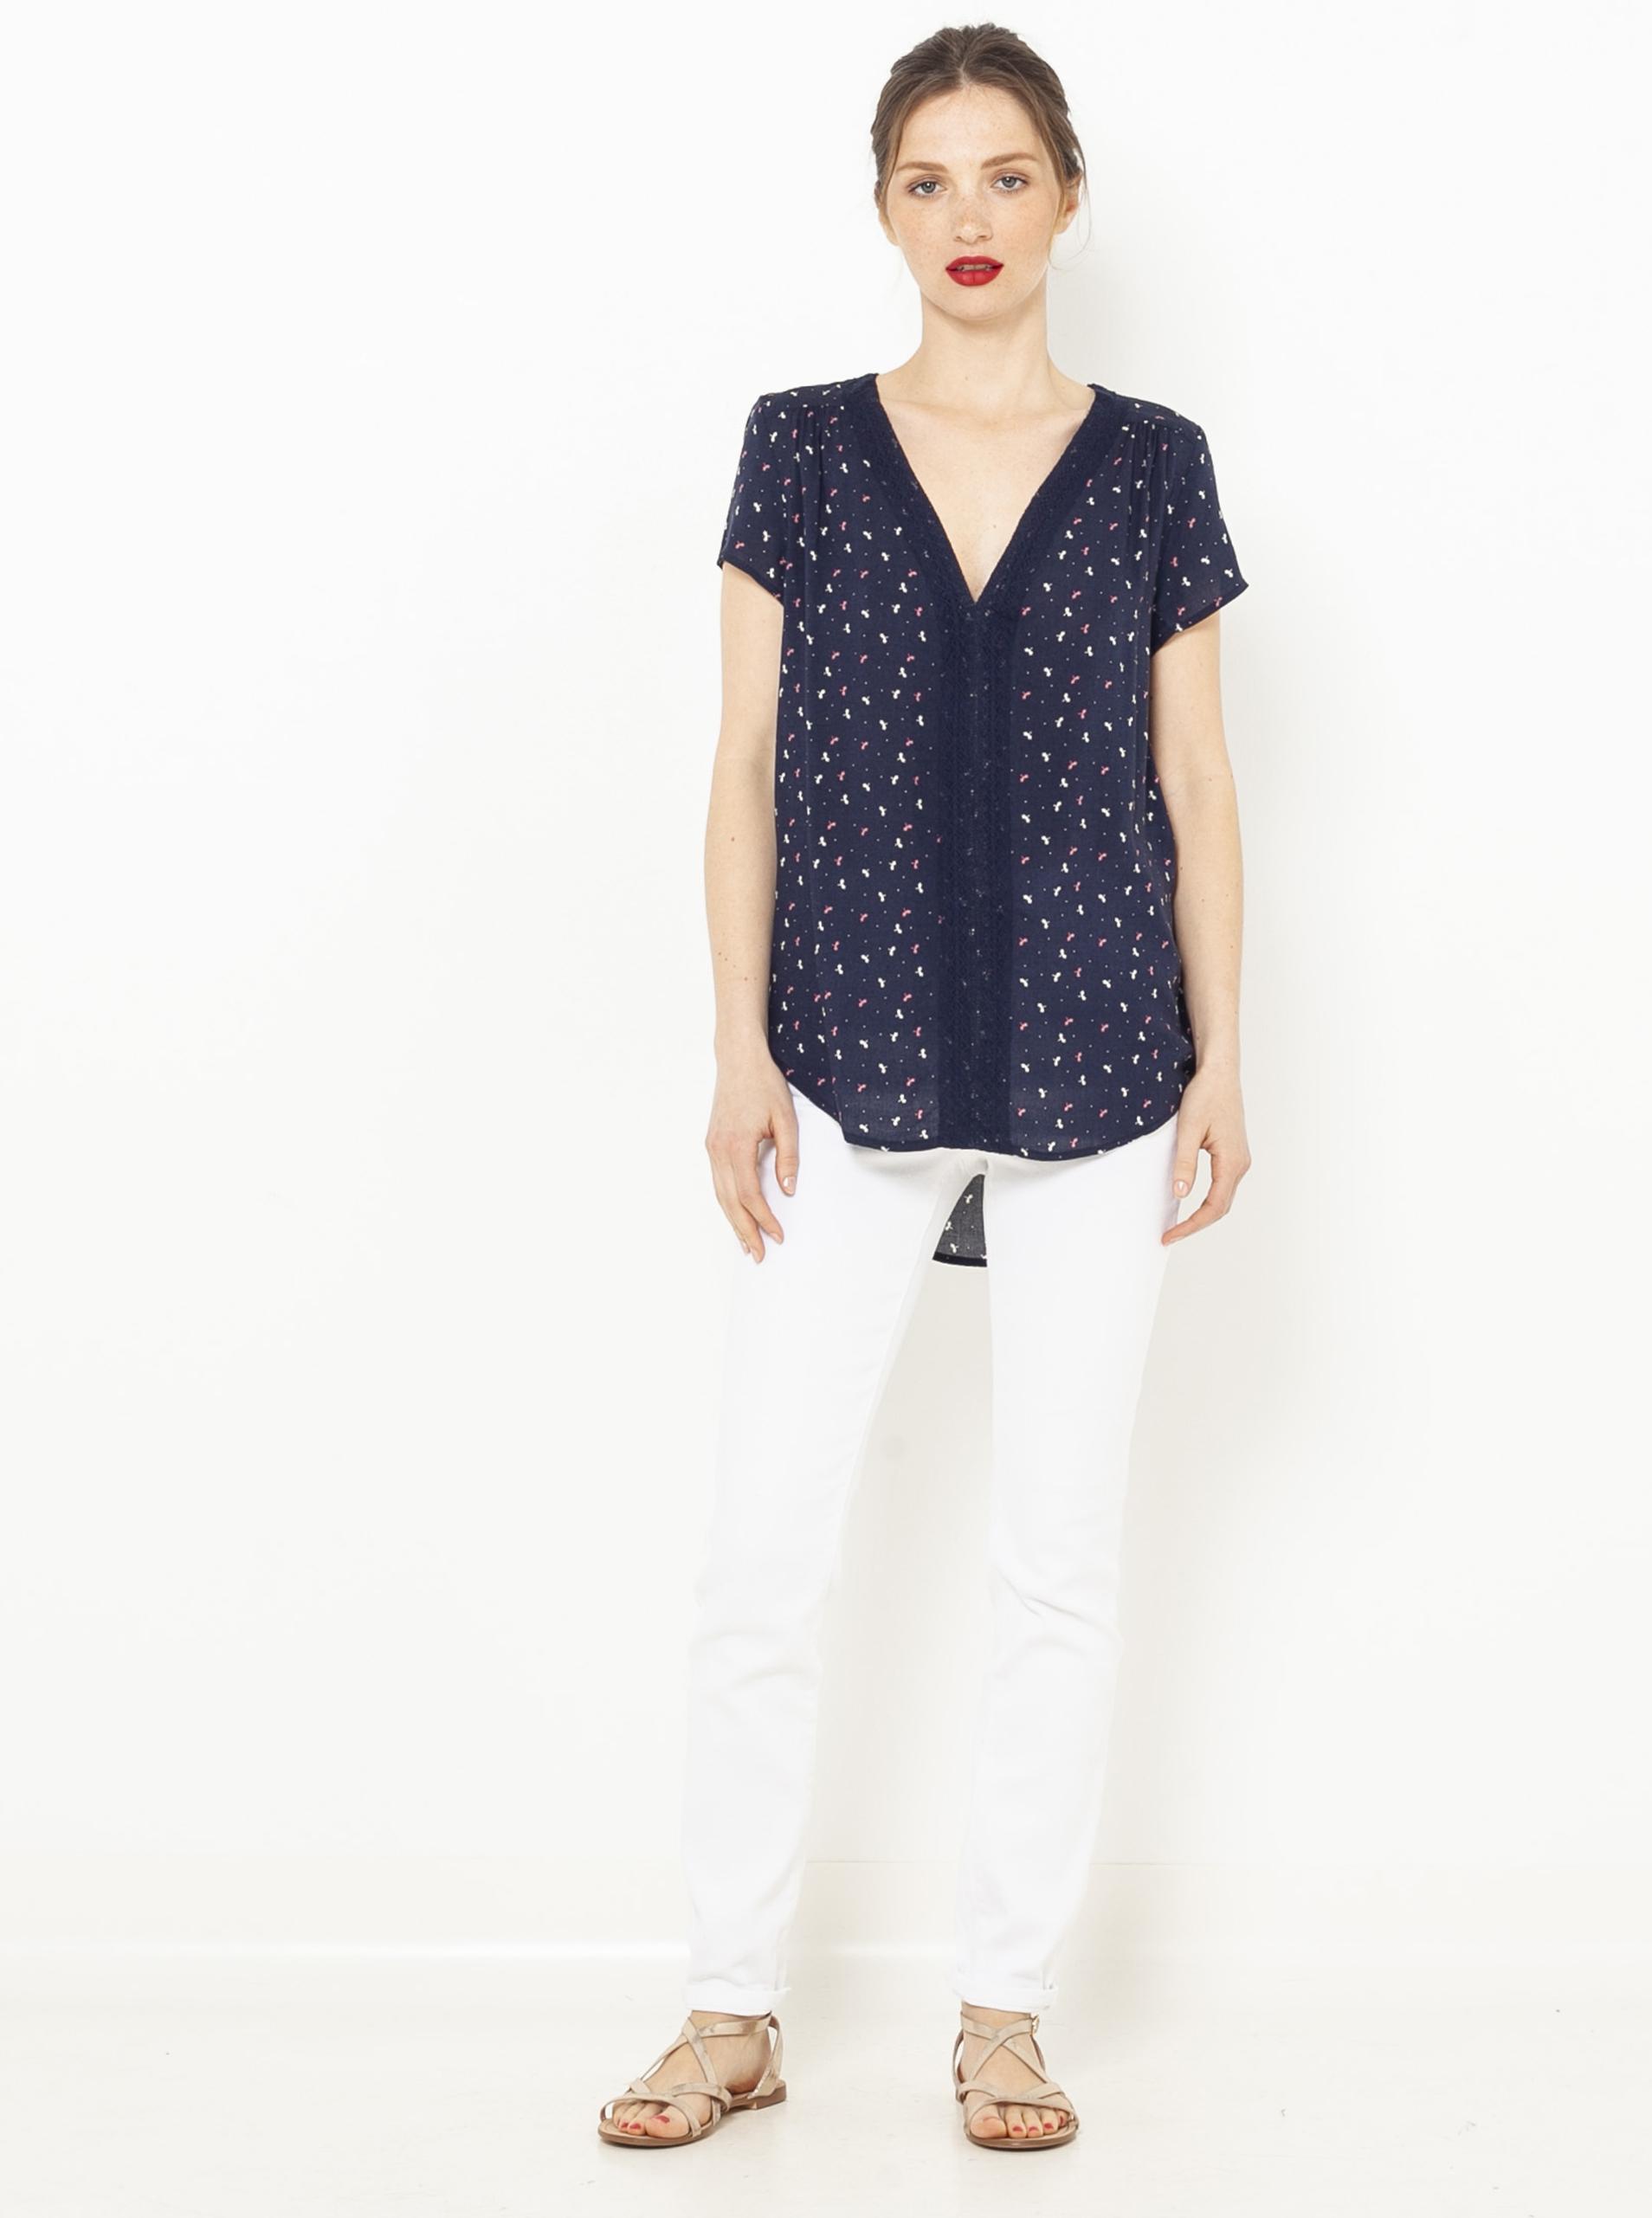 CAMAIEU blue blouse with pattern